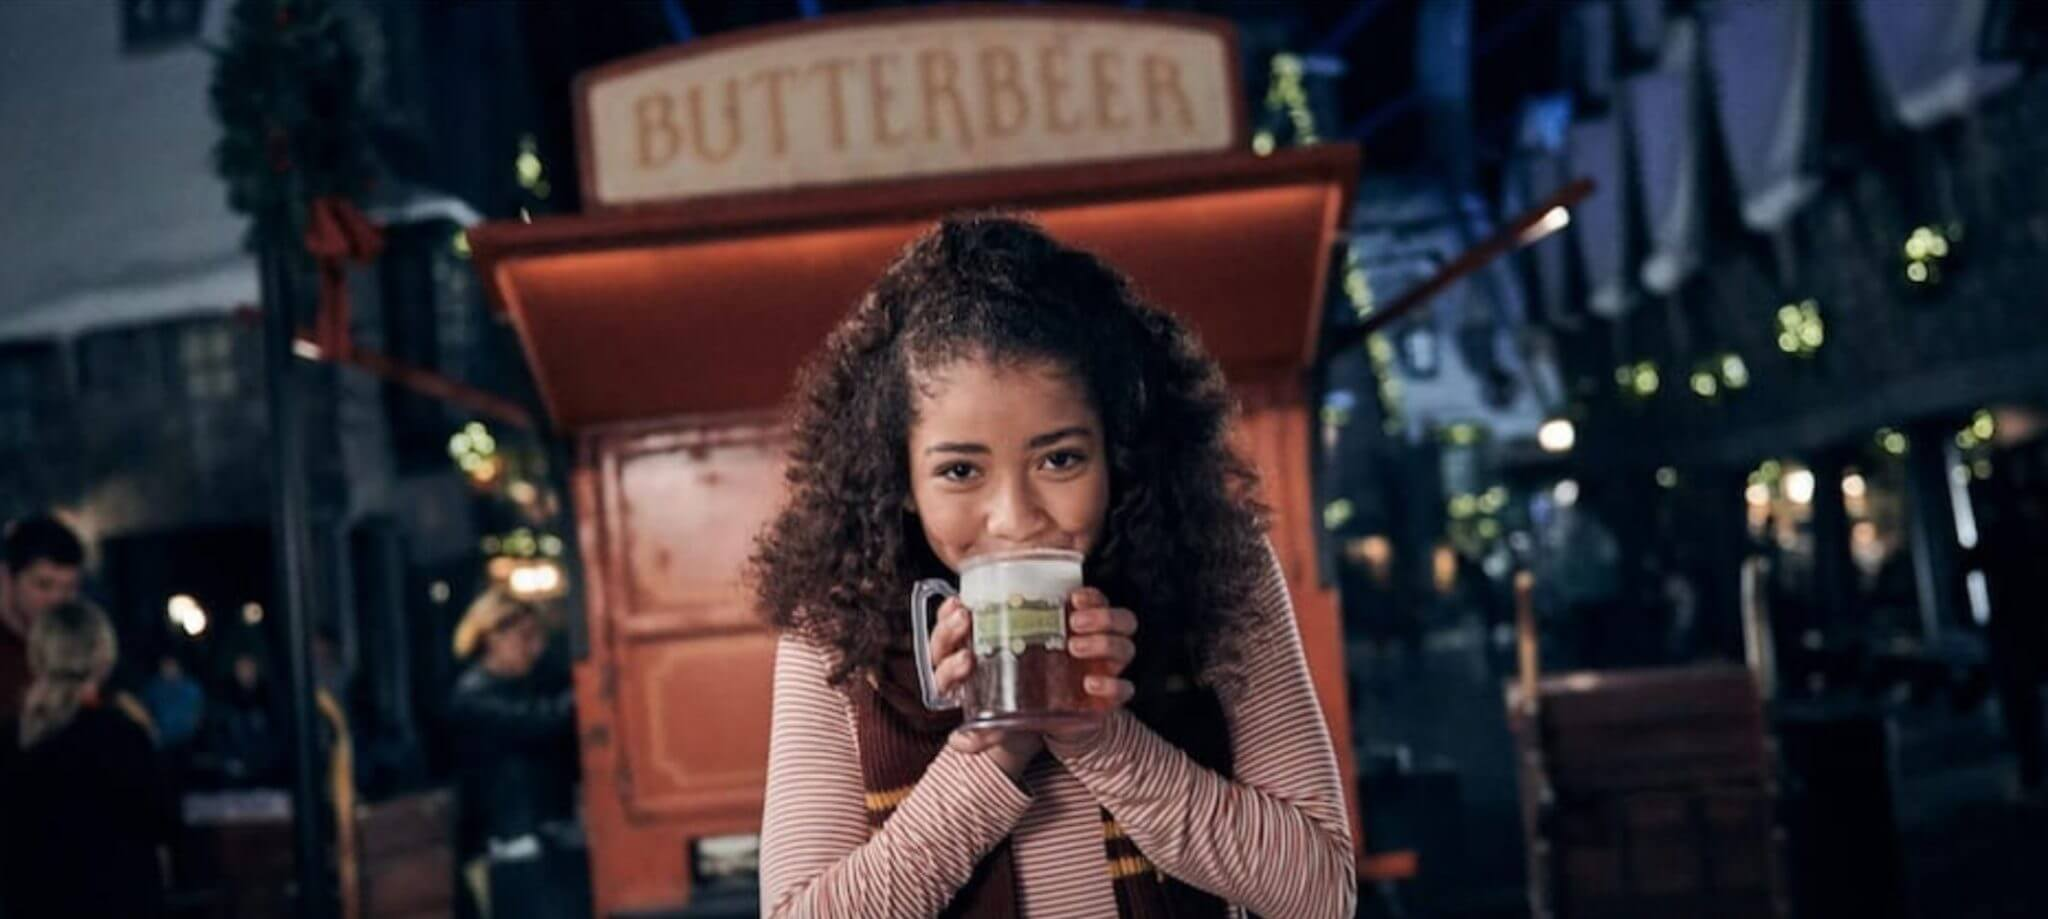 Universal Orlando Holiday Wizarding World Butterbeer